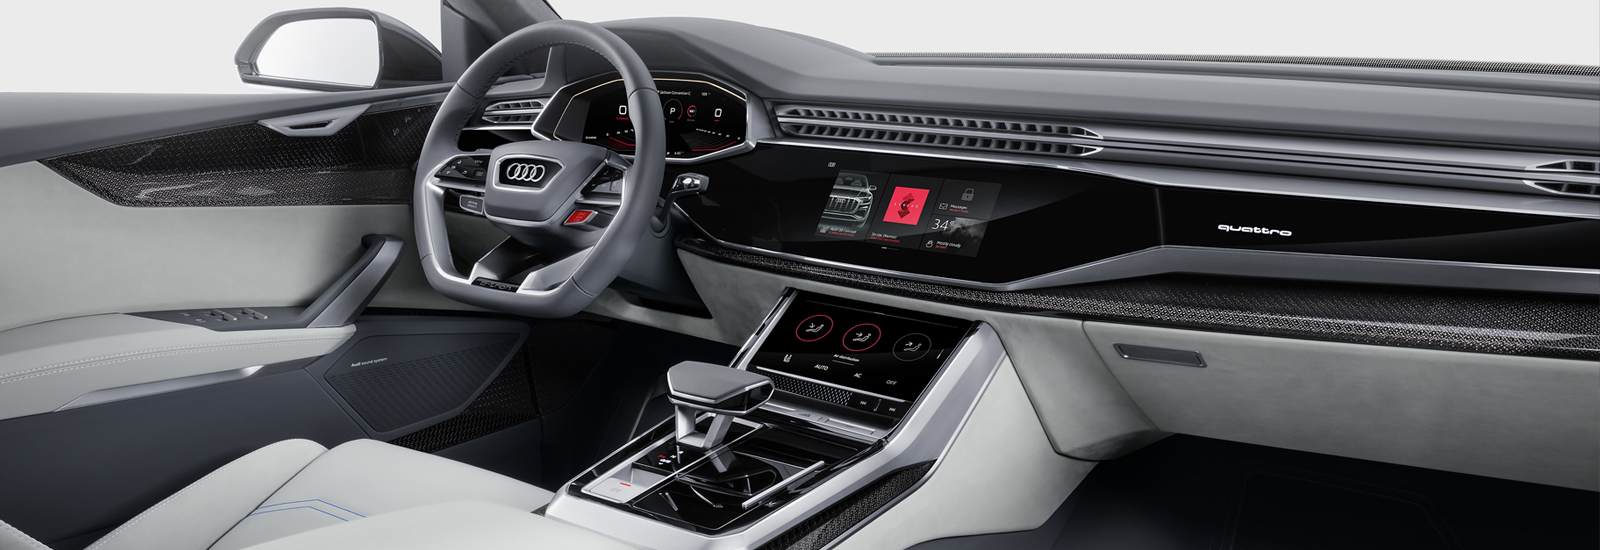 2018 audi concept. exellent concept 2018 audi q8 interior intended audi concept